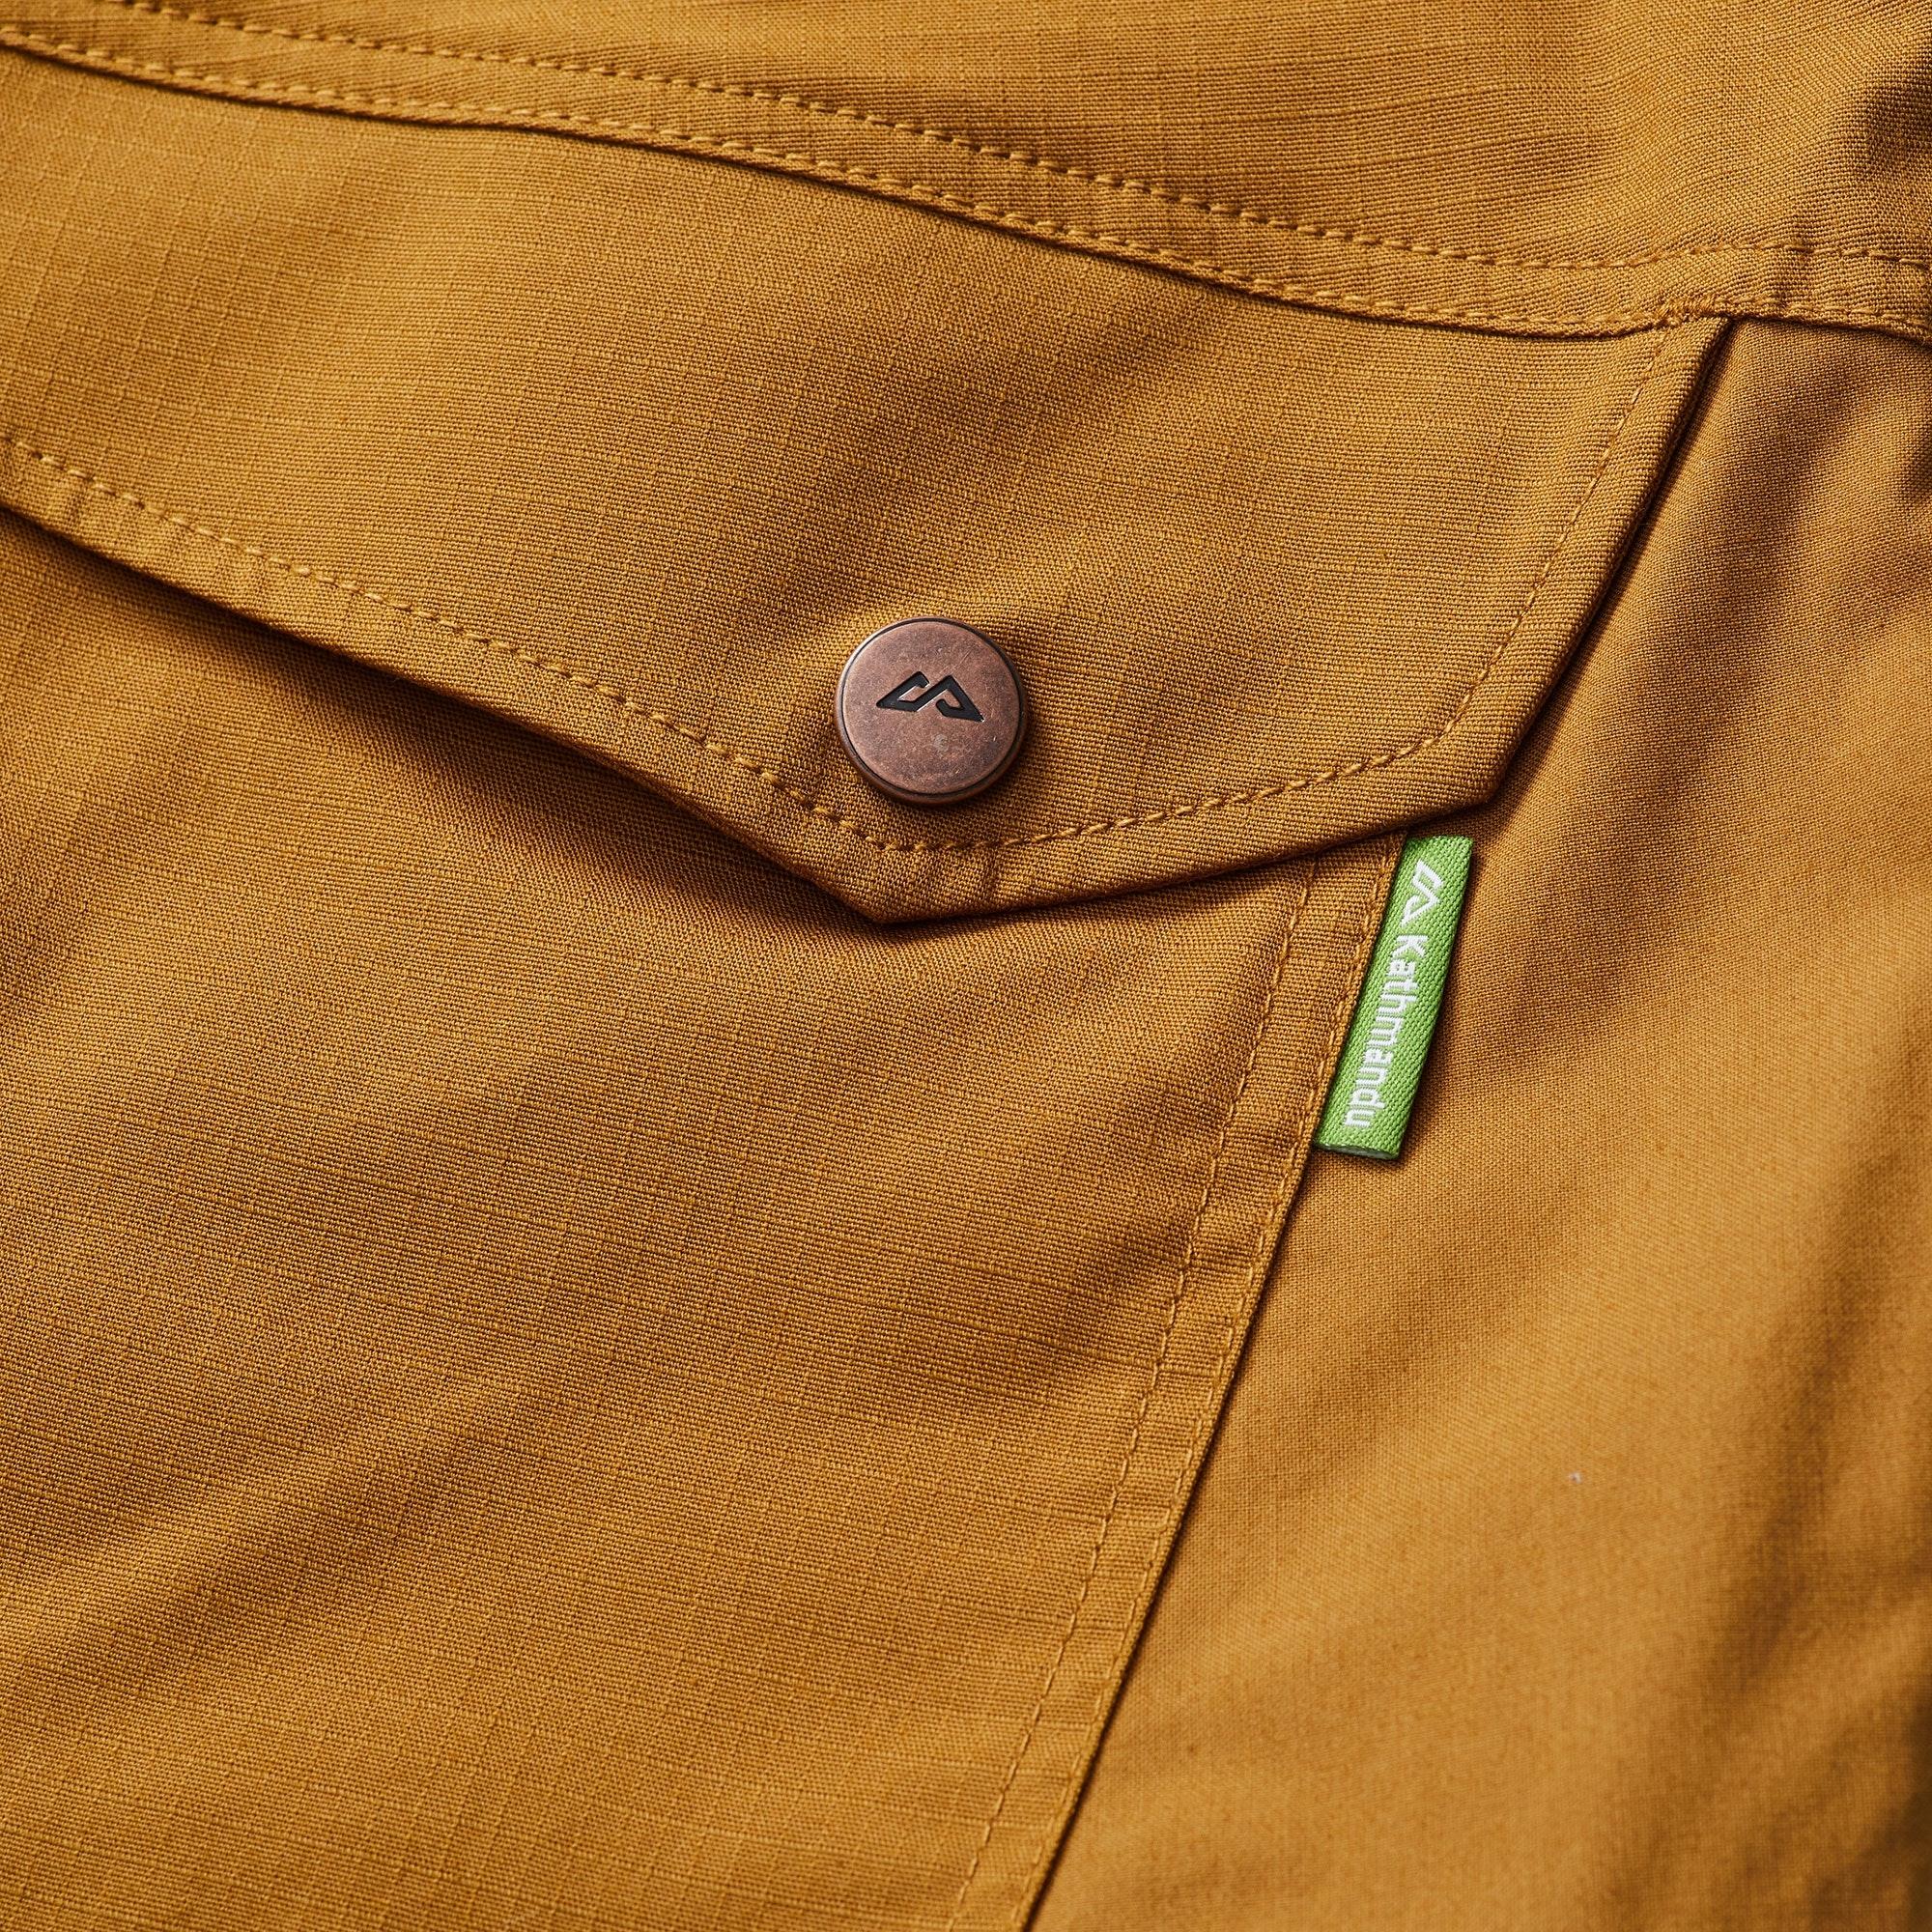 NEW-Kathmandu-Nduro-Mens-Durable-7-Pocket-Hiking-Travel-Cargo-Shorts